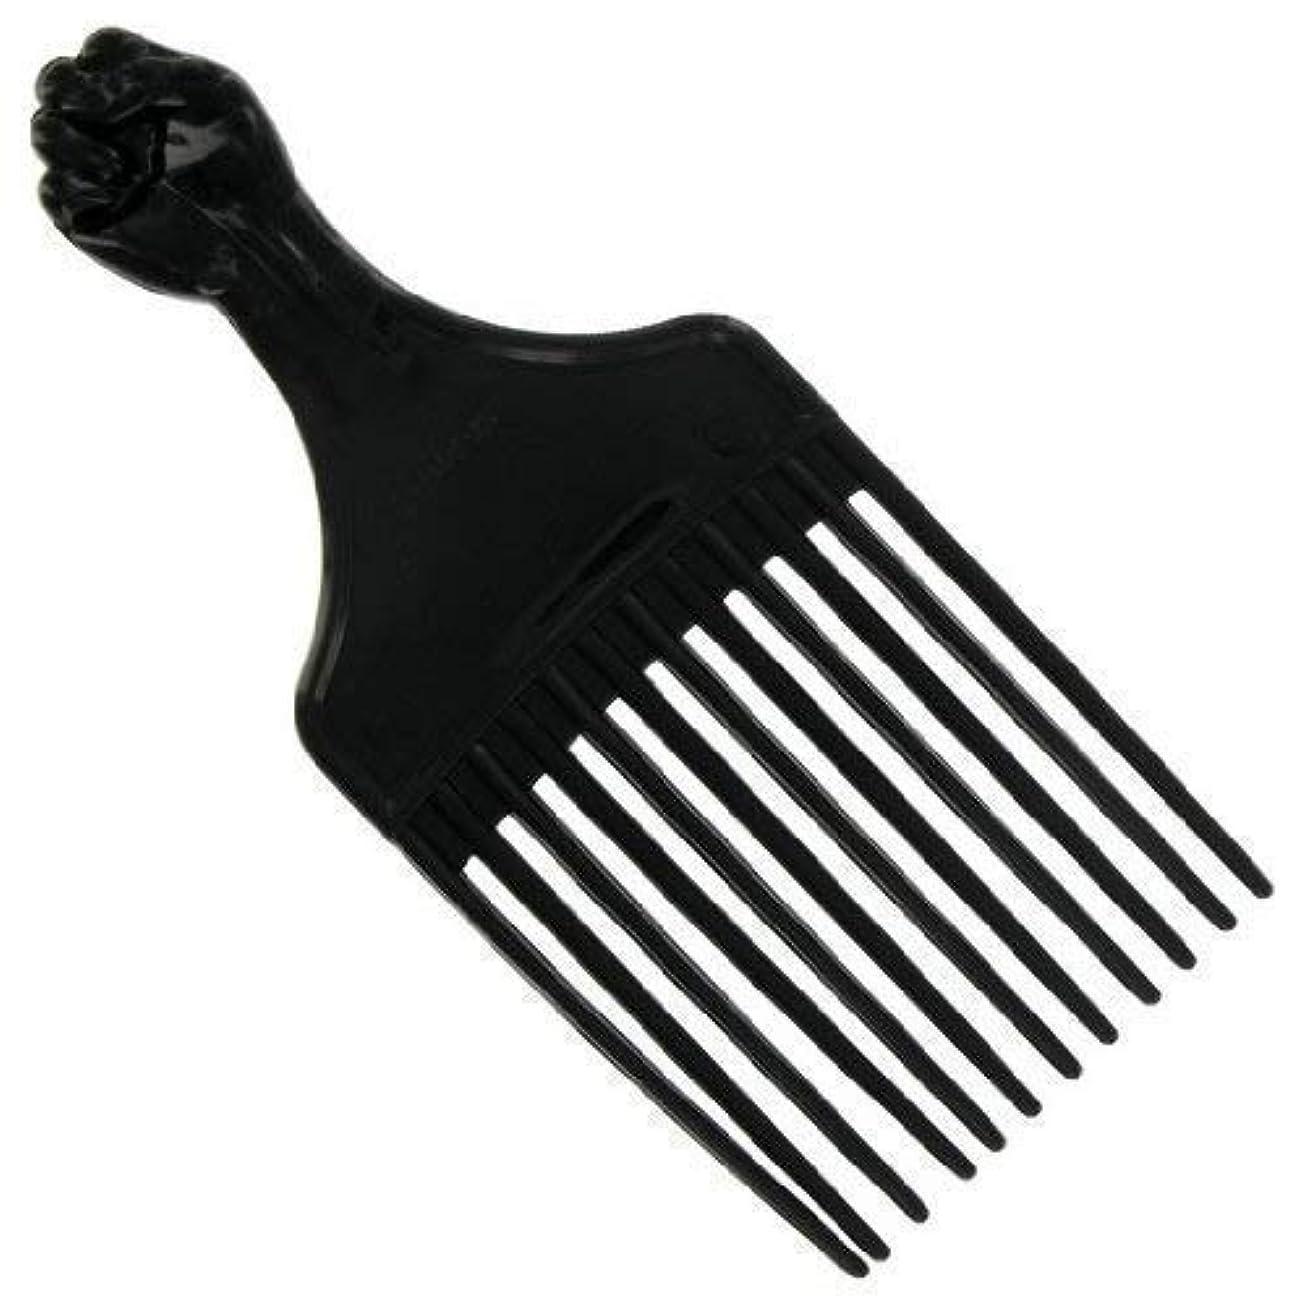 博覧会防ぐ喜劇Afro Hair Pick (F-7027) [並行輸入品]